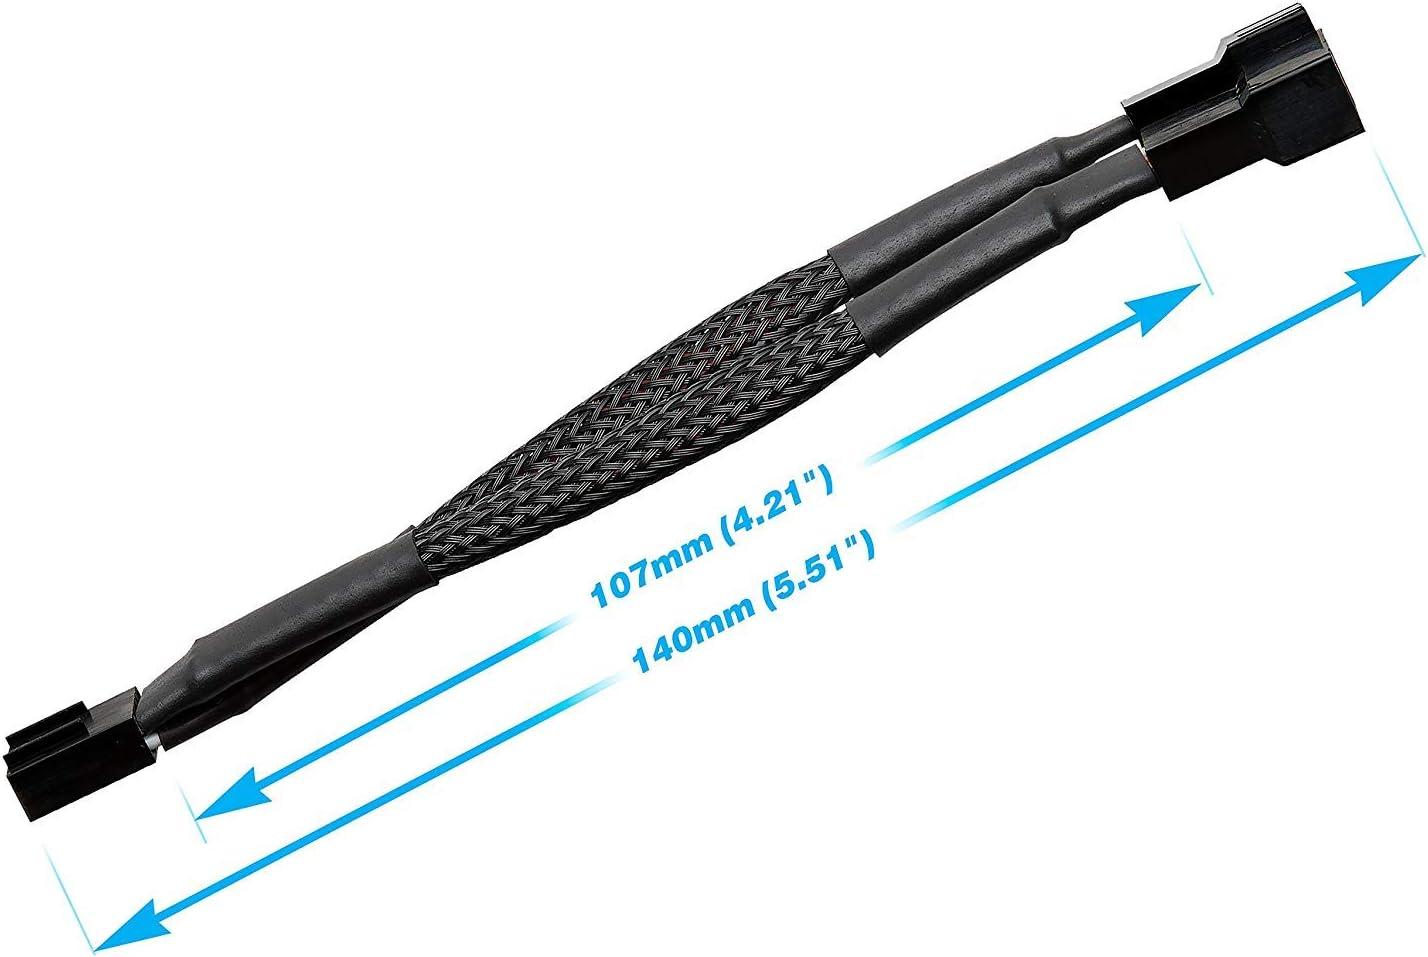 1-Pack Easycargo 30cm Case Fan Extension Cable 3 pin 4 pin Case Fan Power Extension PWM Fan Cable Extension